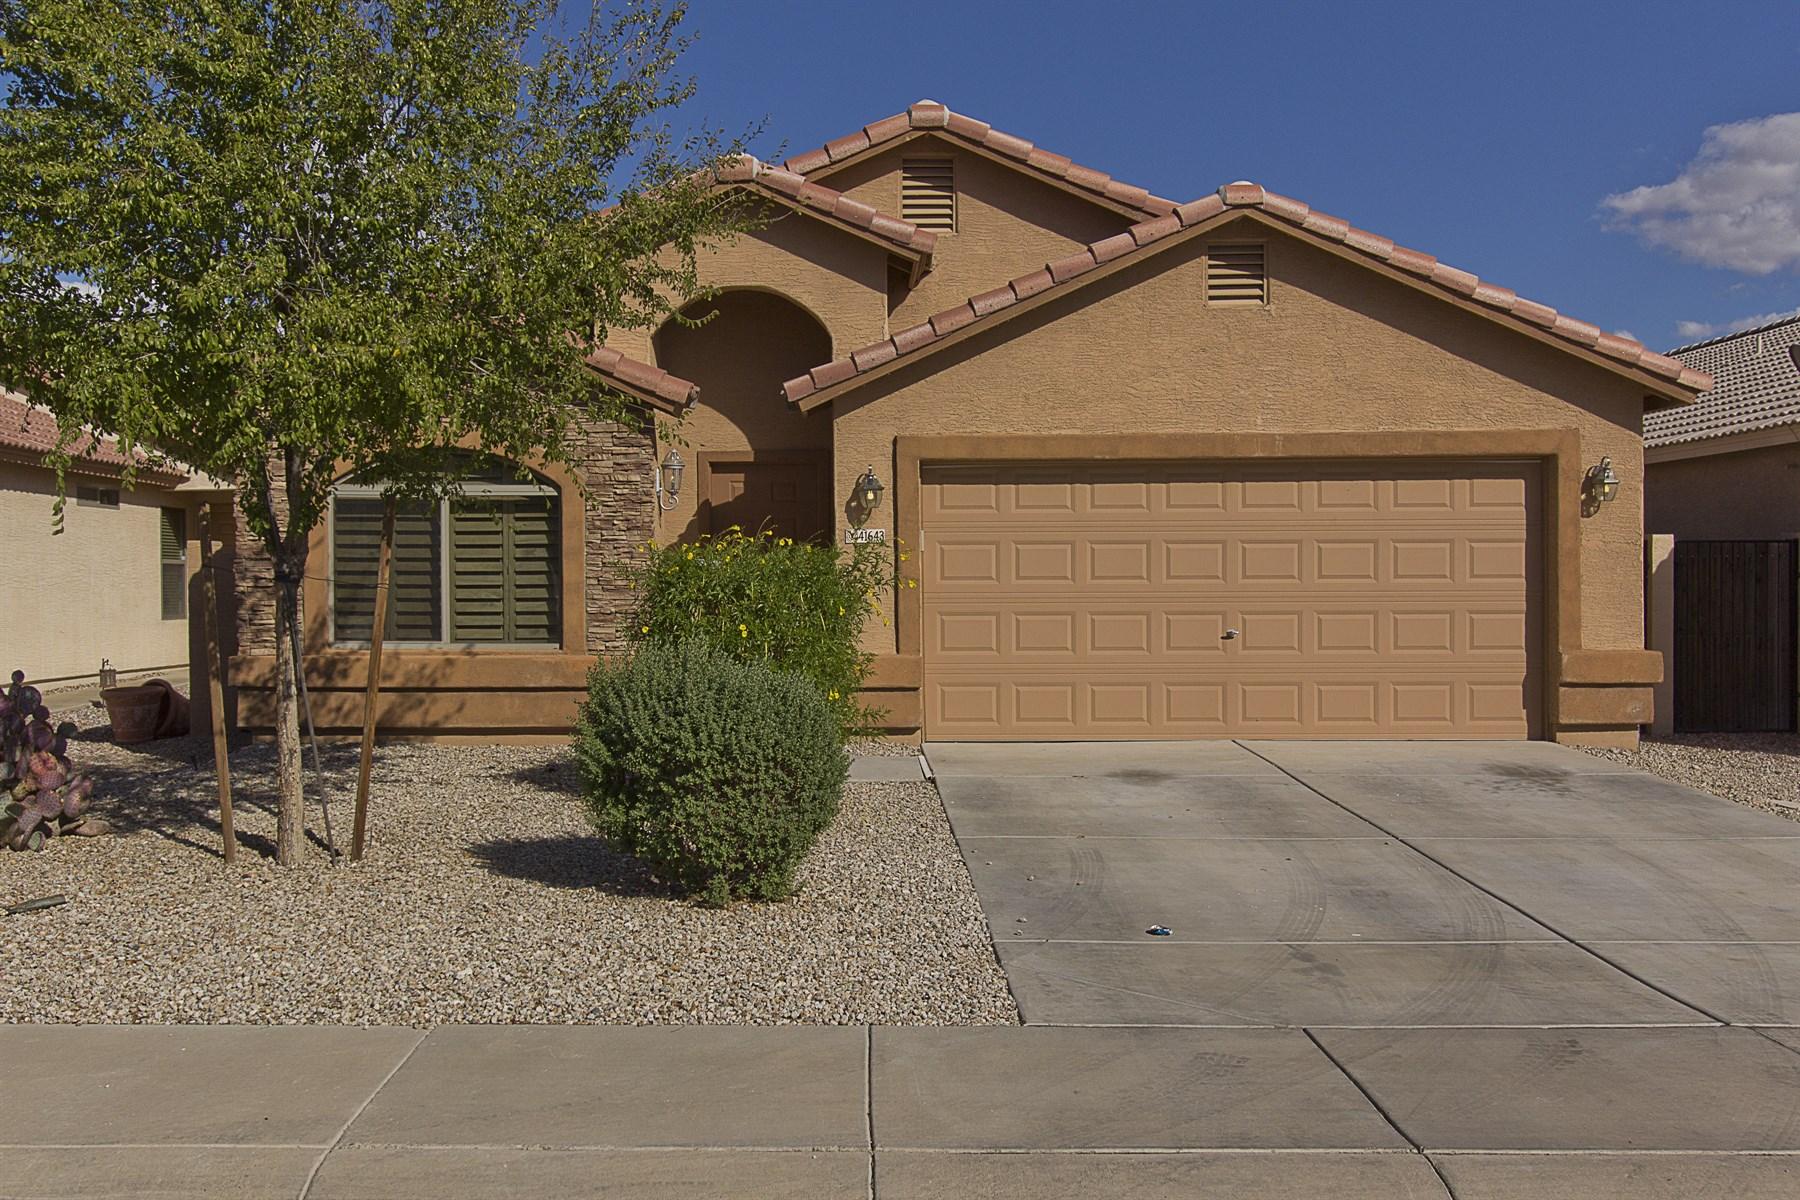 Villa per Vendita alle ore Lovely home in a wonderful neighborhood 41643 N Ranch Dr San Tan Valley, Arizona 85140 Stati Uniti